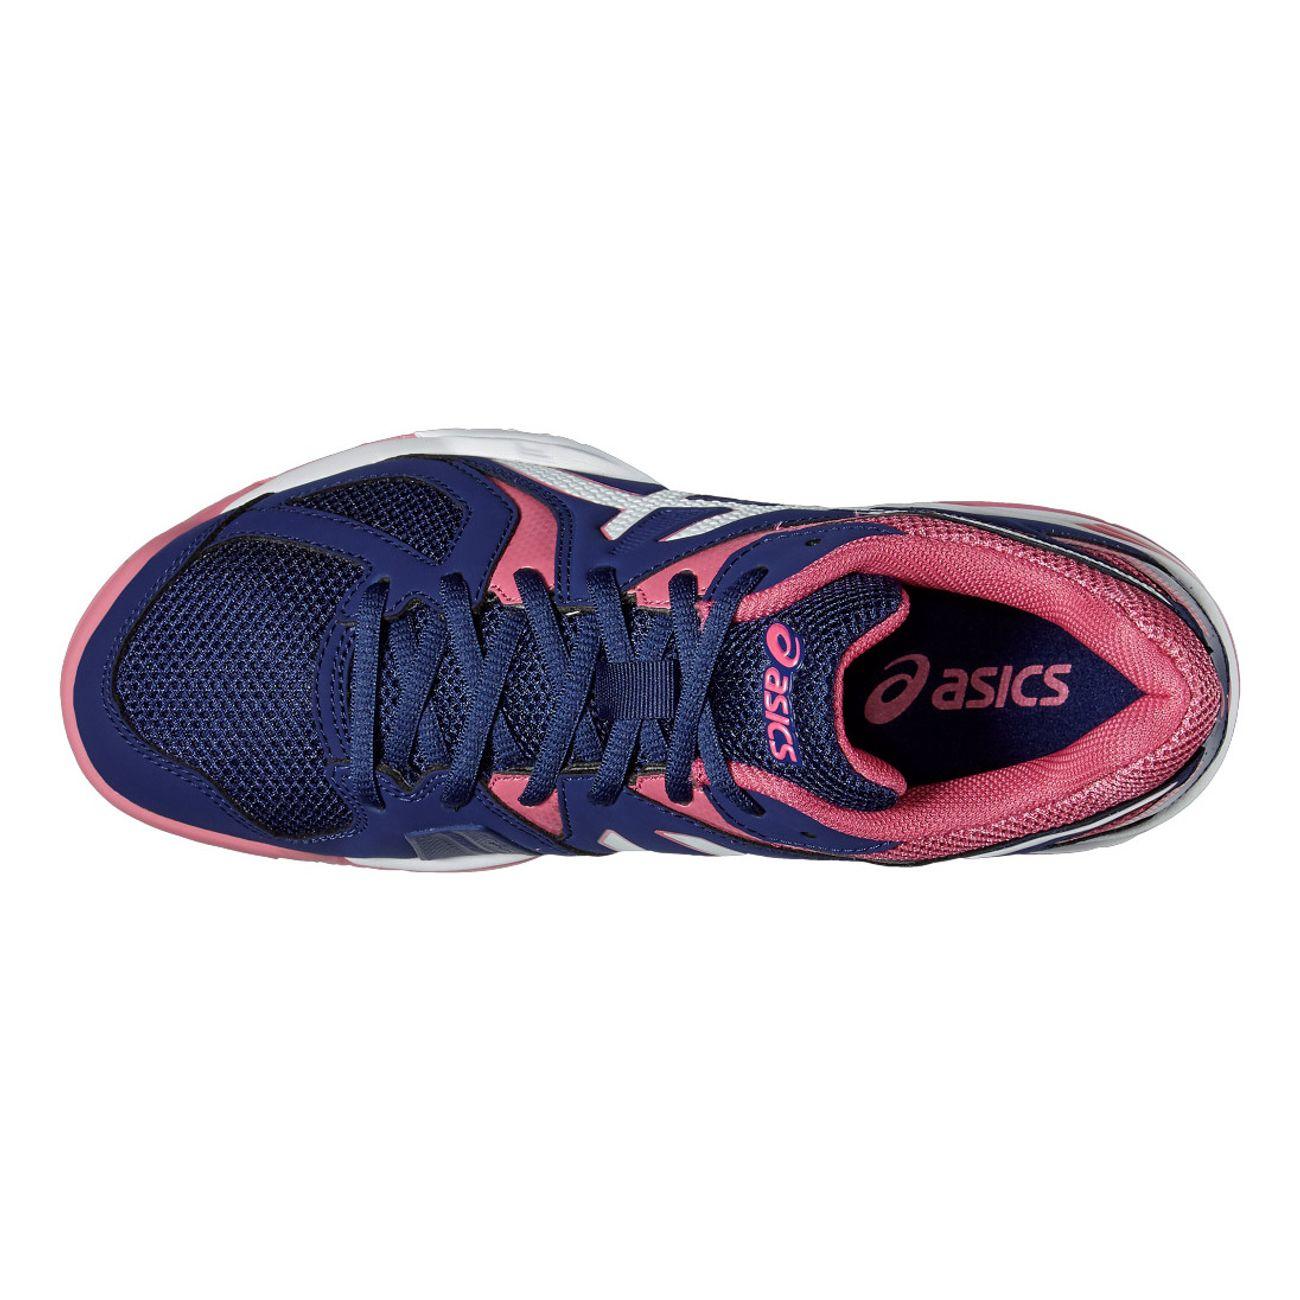 Handball femme ASICS Chaussures femme Asics Gel HUNTER 3